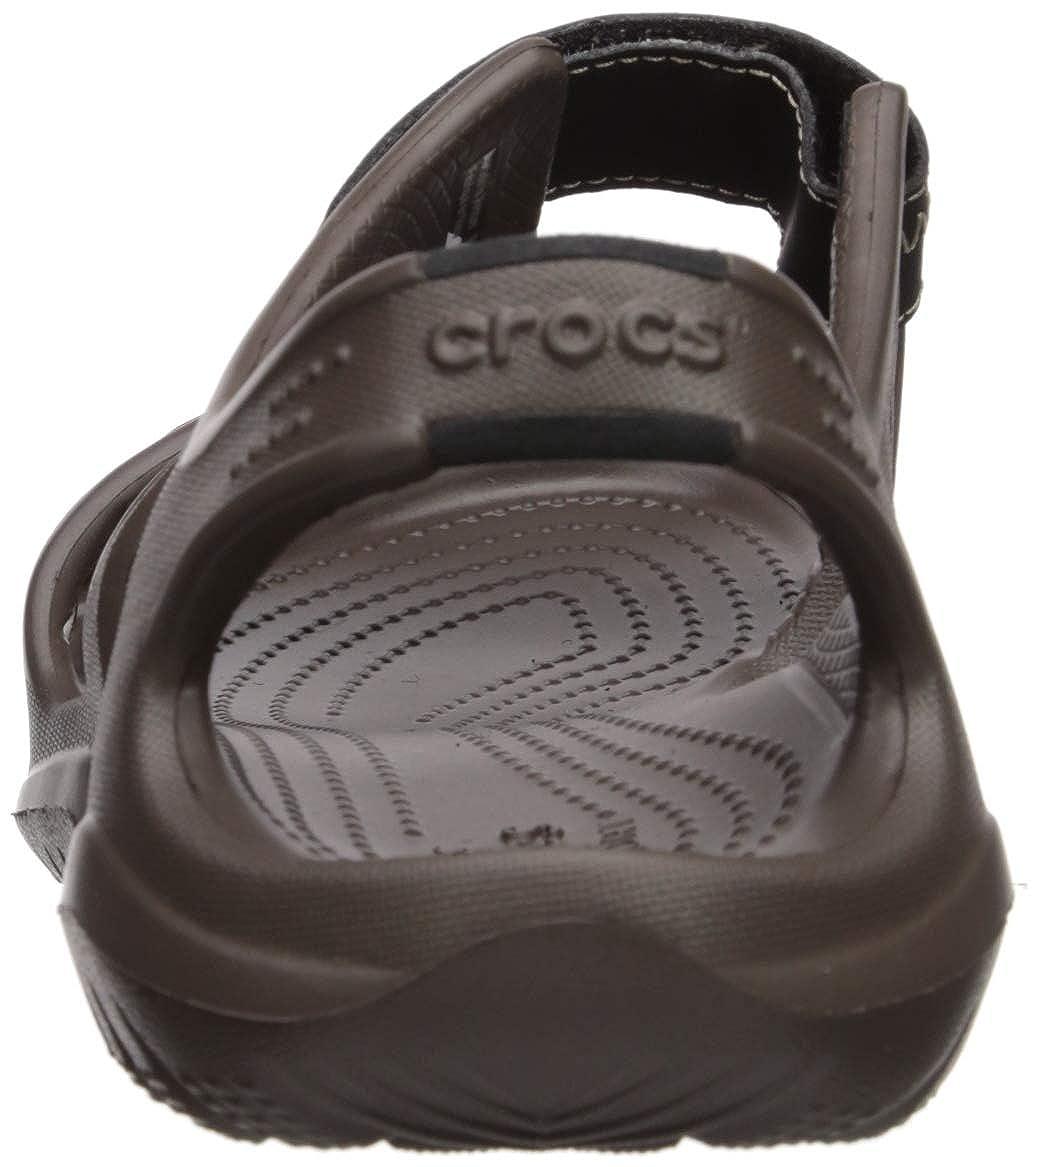 2417c1c083f97 Crocs Men Swiftwater River Fisherman Sandal  Amazon.co.uk  Shoes   Bags